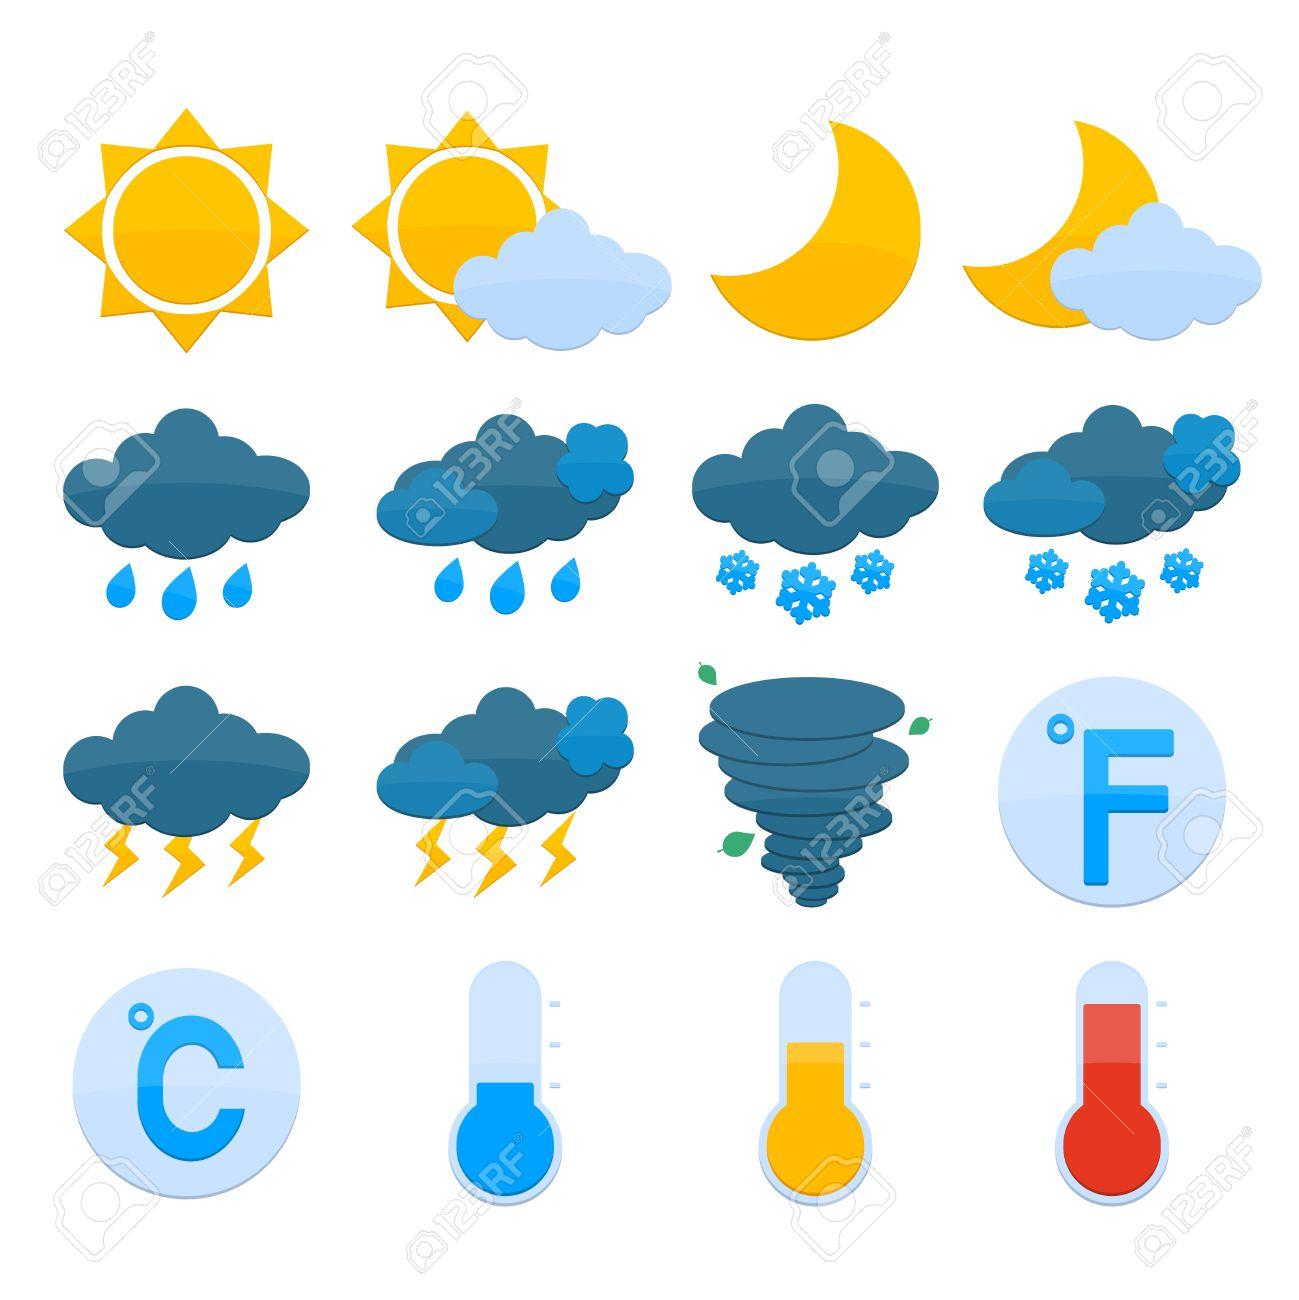 Weather Forecast Symbols Color Icons Set Of Sun Cloud Rain Snow